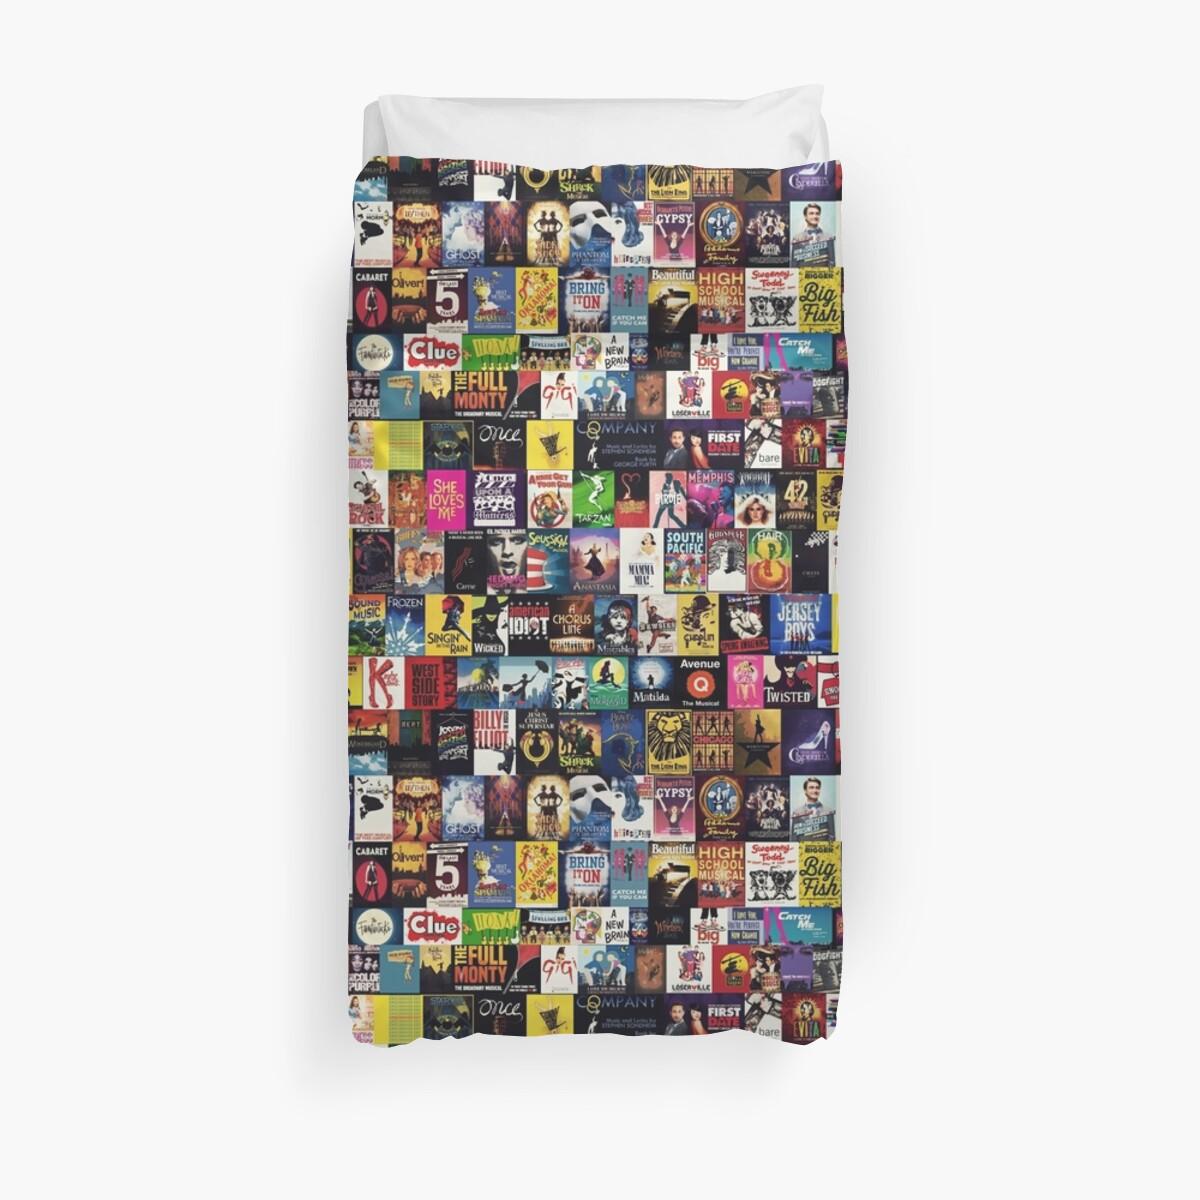 MUSICALS 2 (Duvet, phone case, mug, sticker etc) by thatthespian